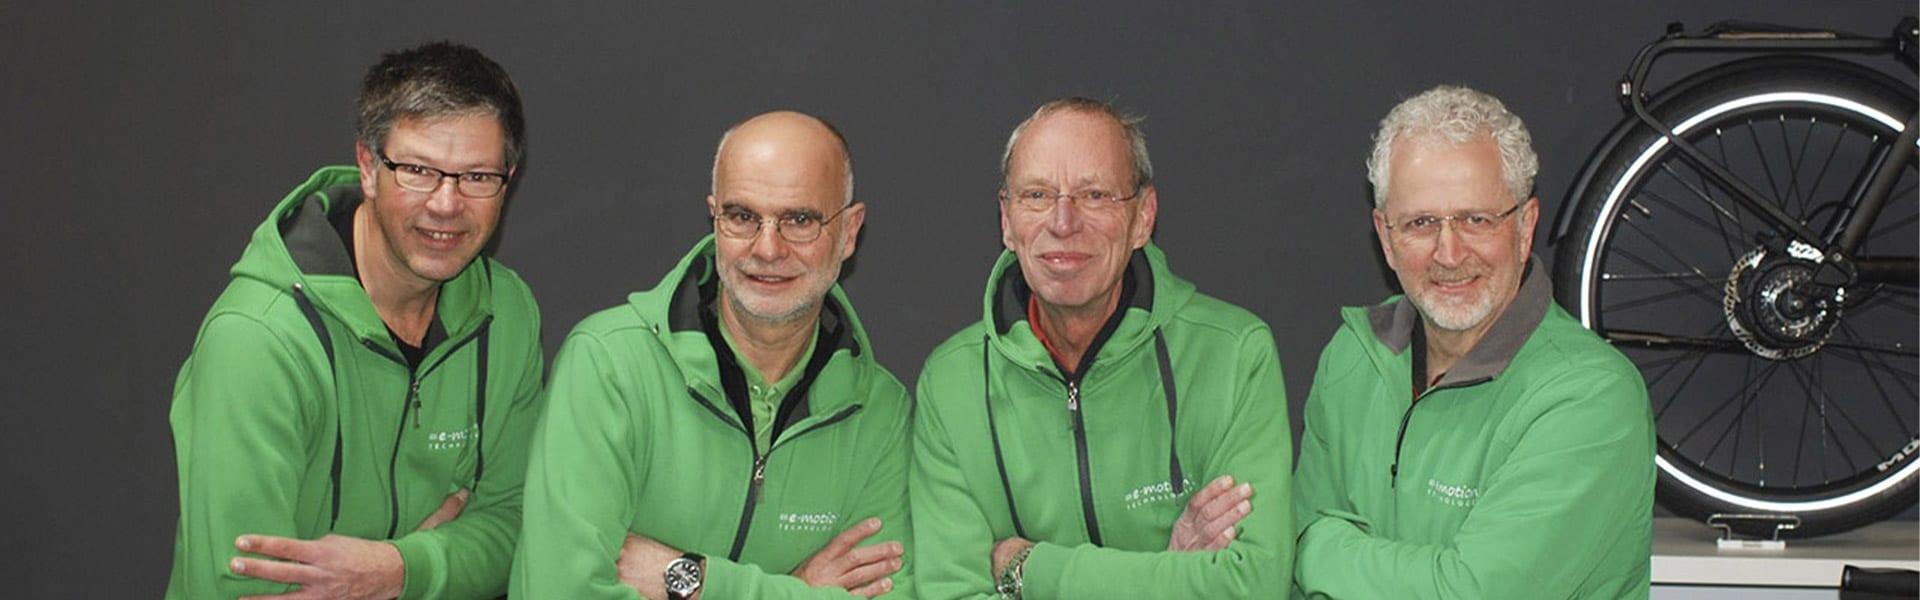 Das Team der e-motion e-Bike Welt Hamm